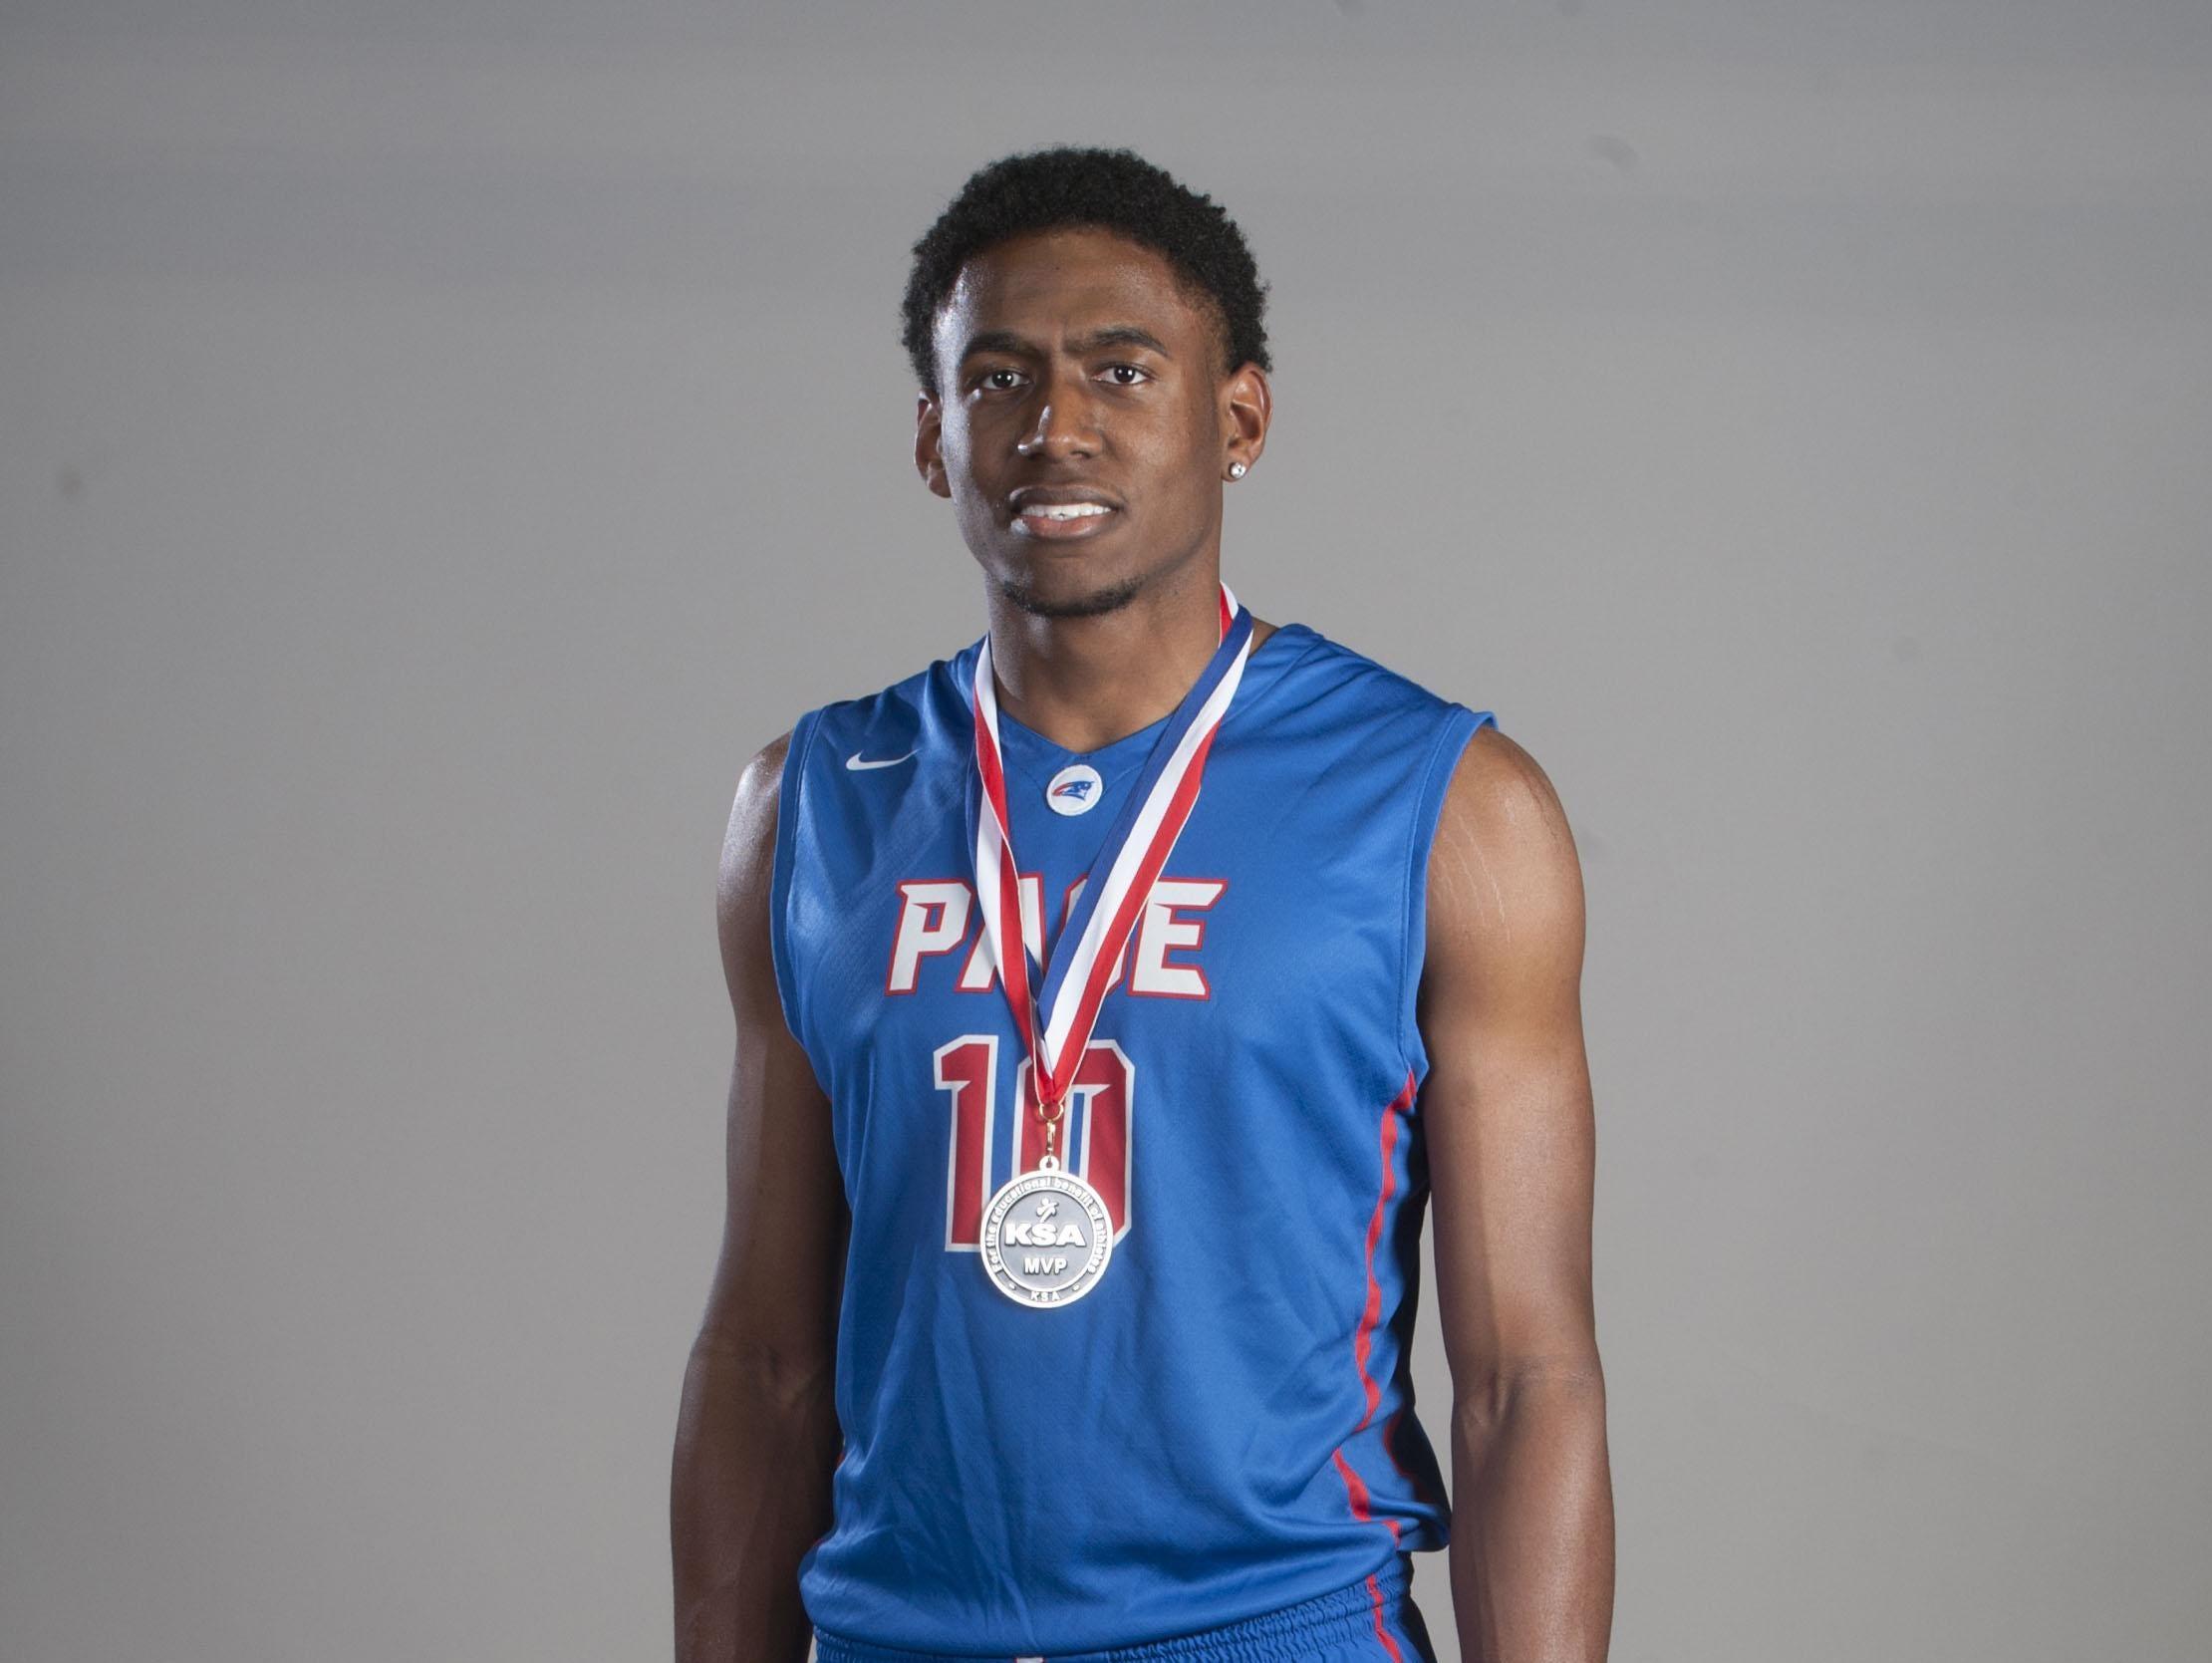 Jahmiah Simmons, Pace basketball